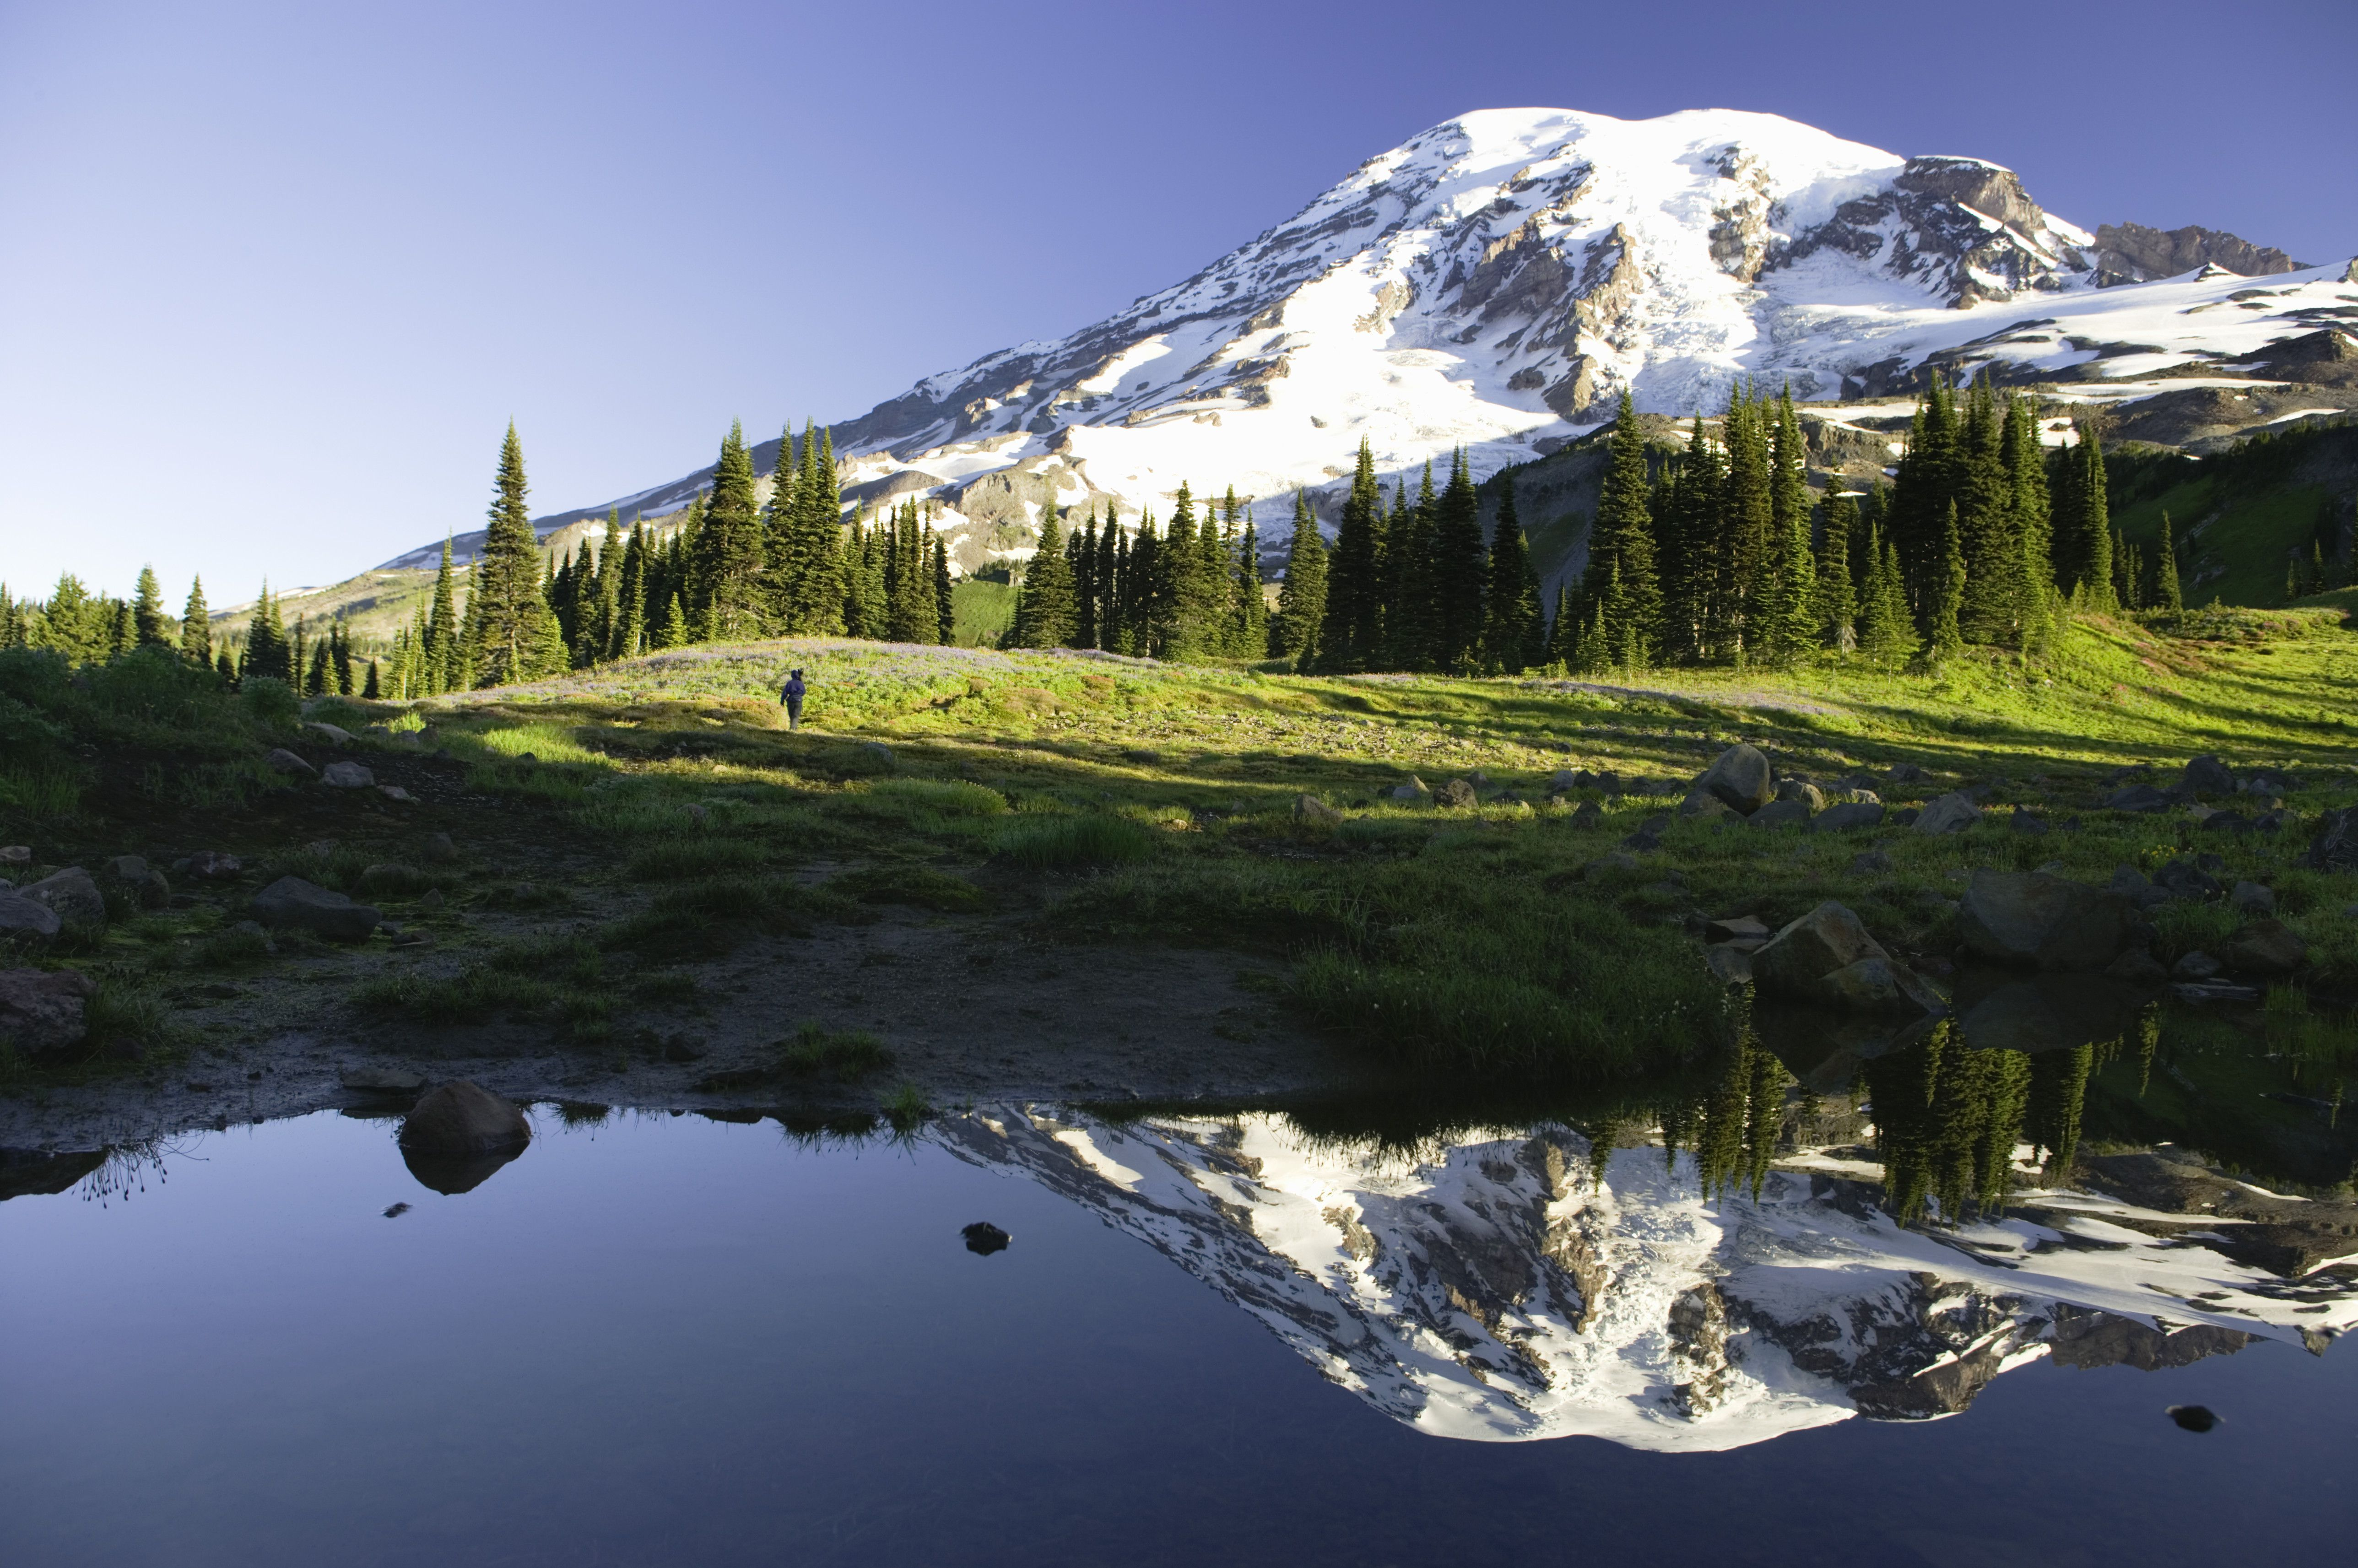 USA, Washington, Mt. Rainier National Park, hiker on path